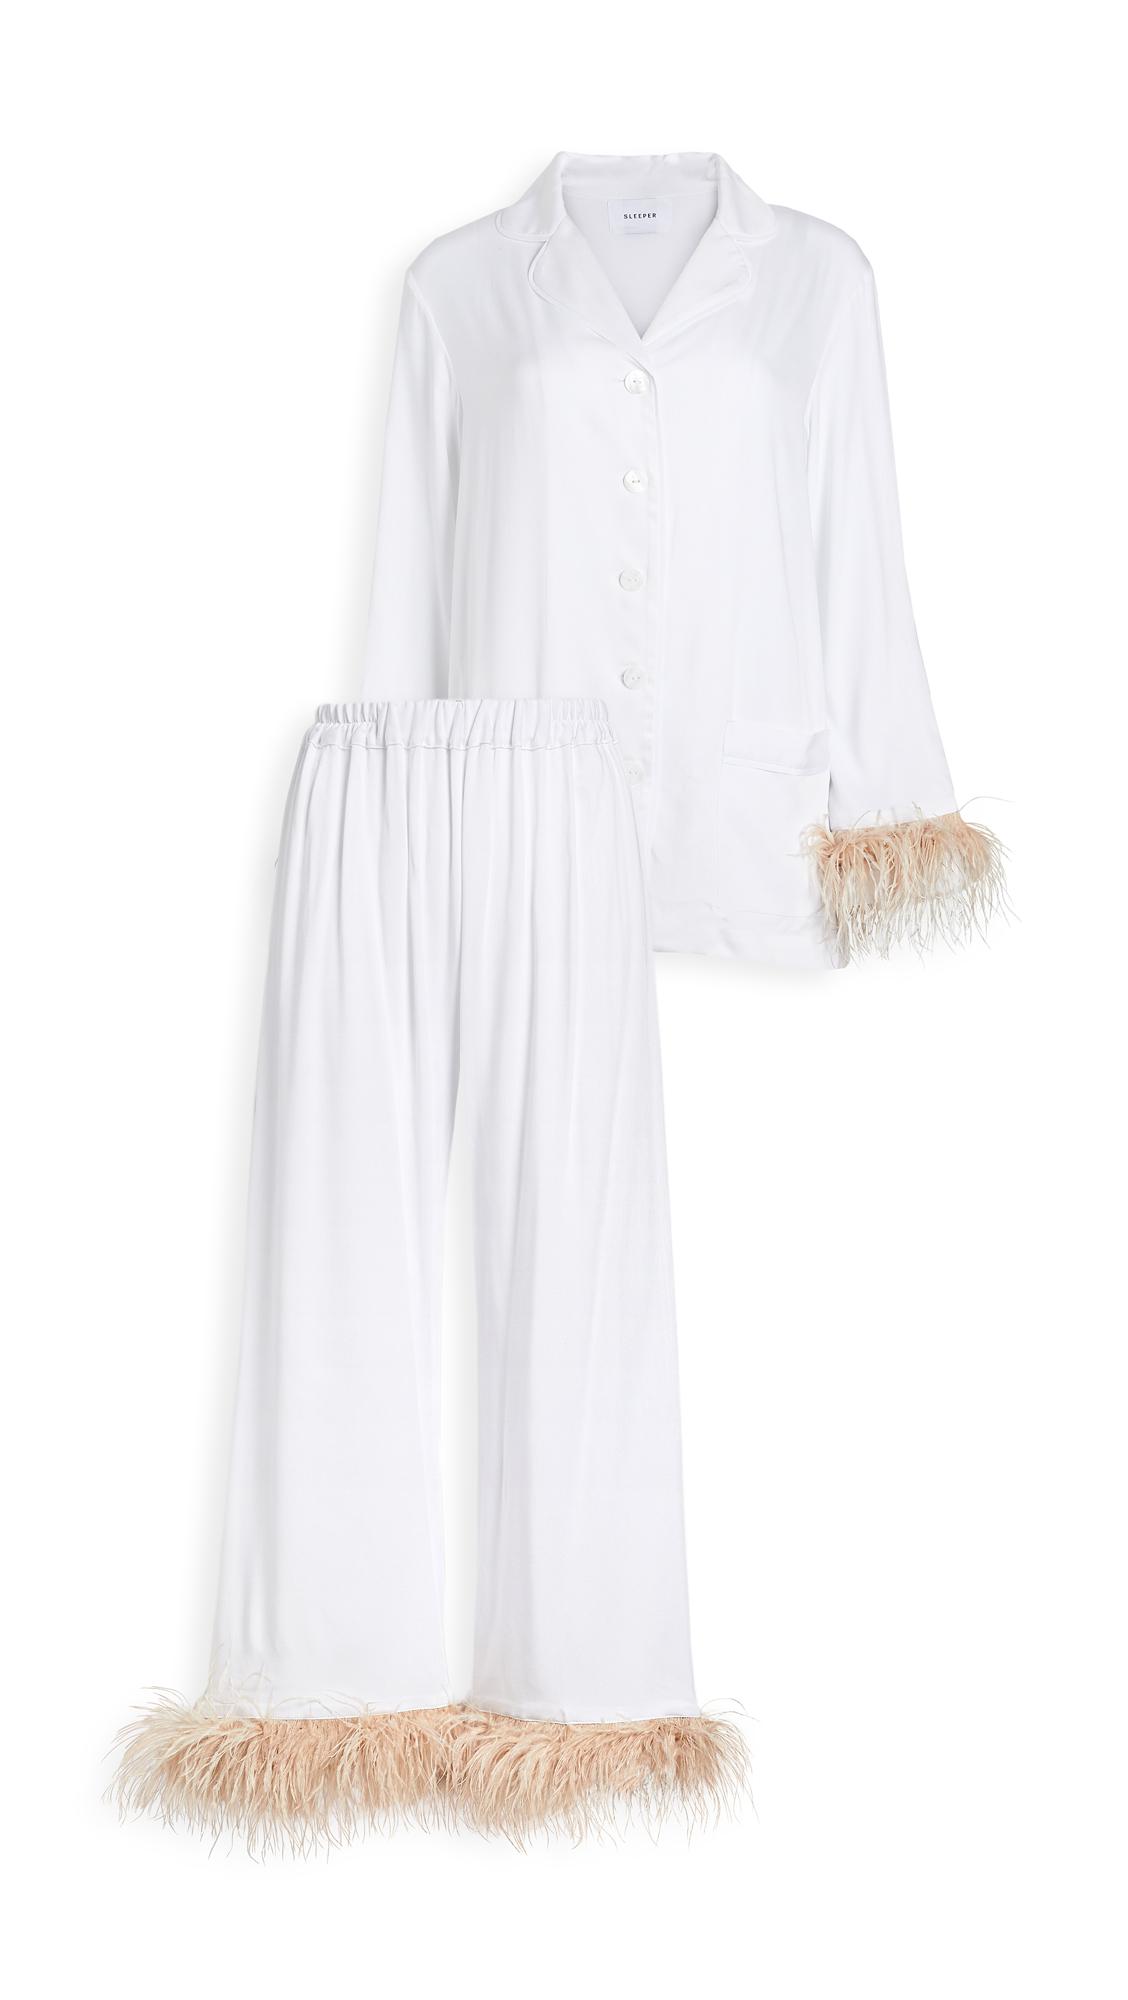 Sleeper Pajama Set with Feathers